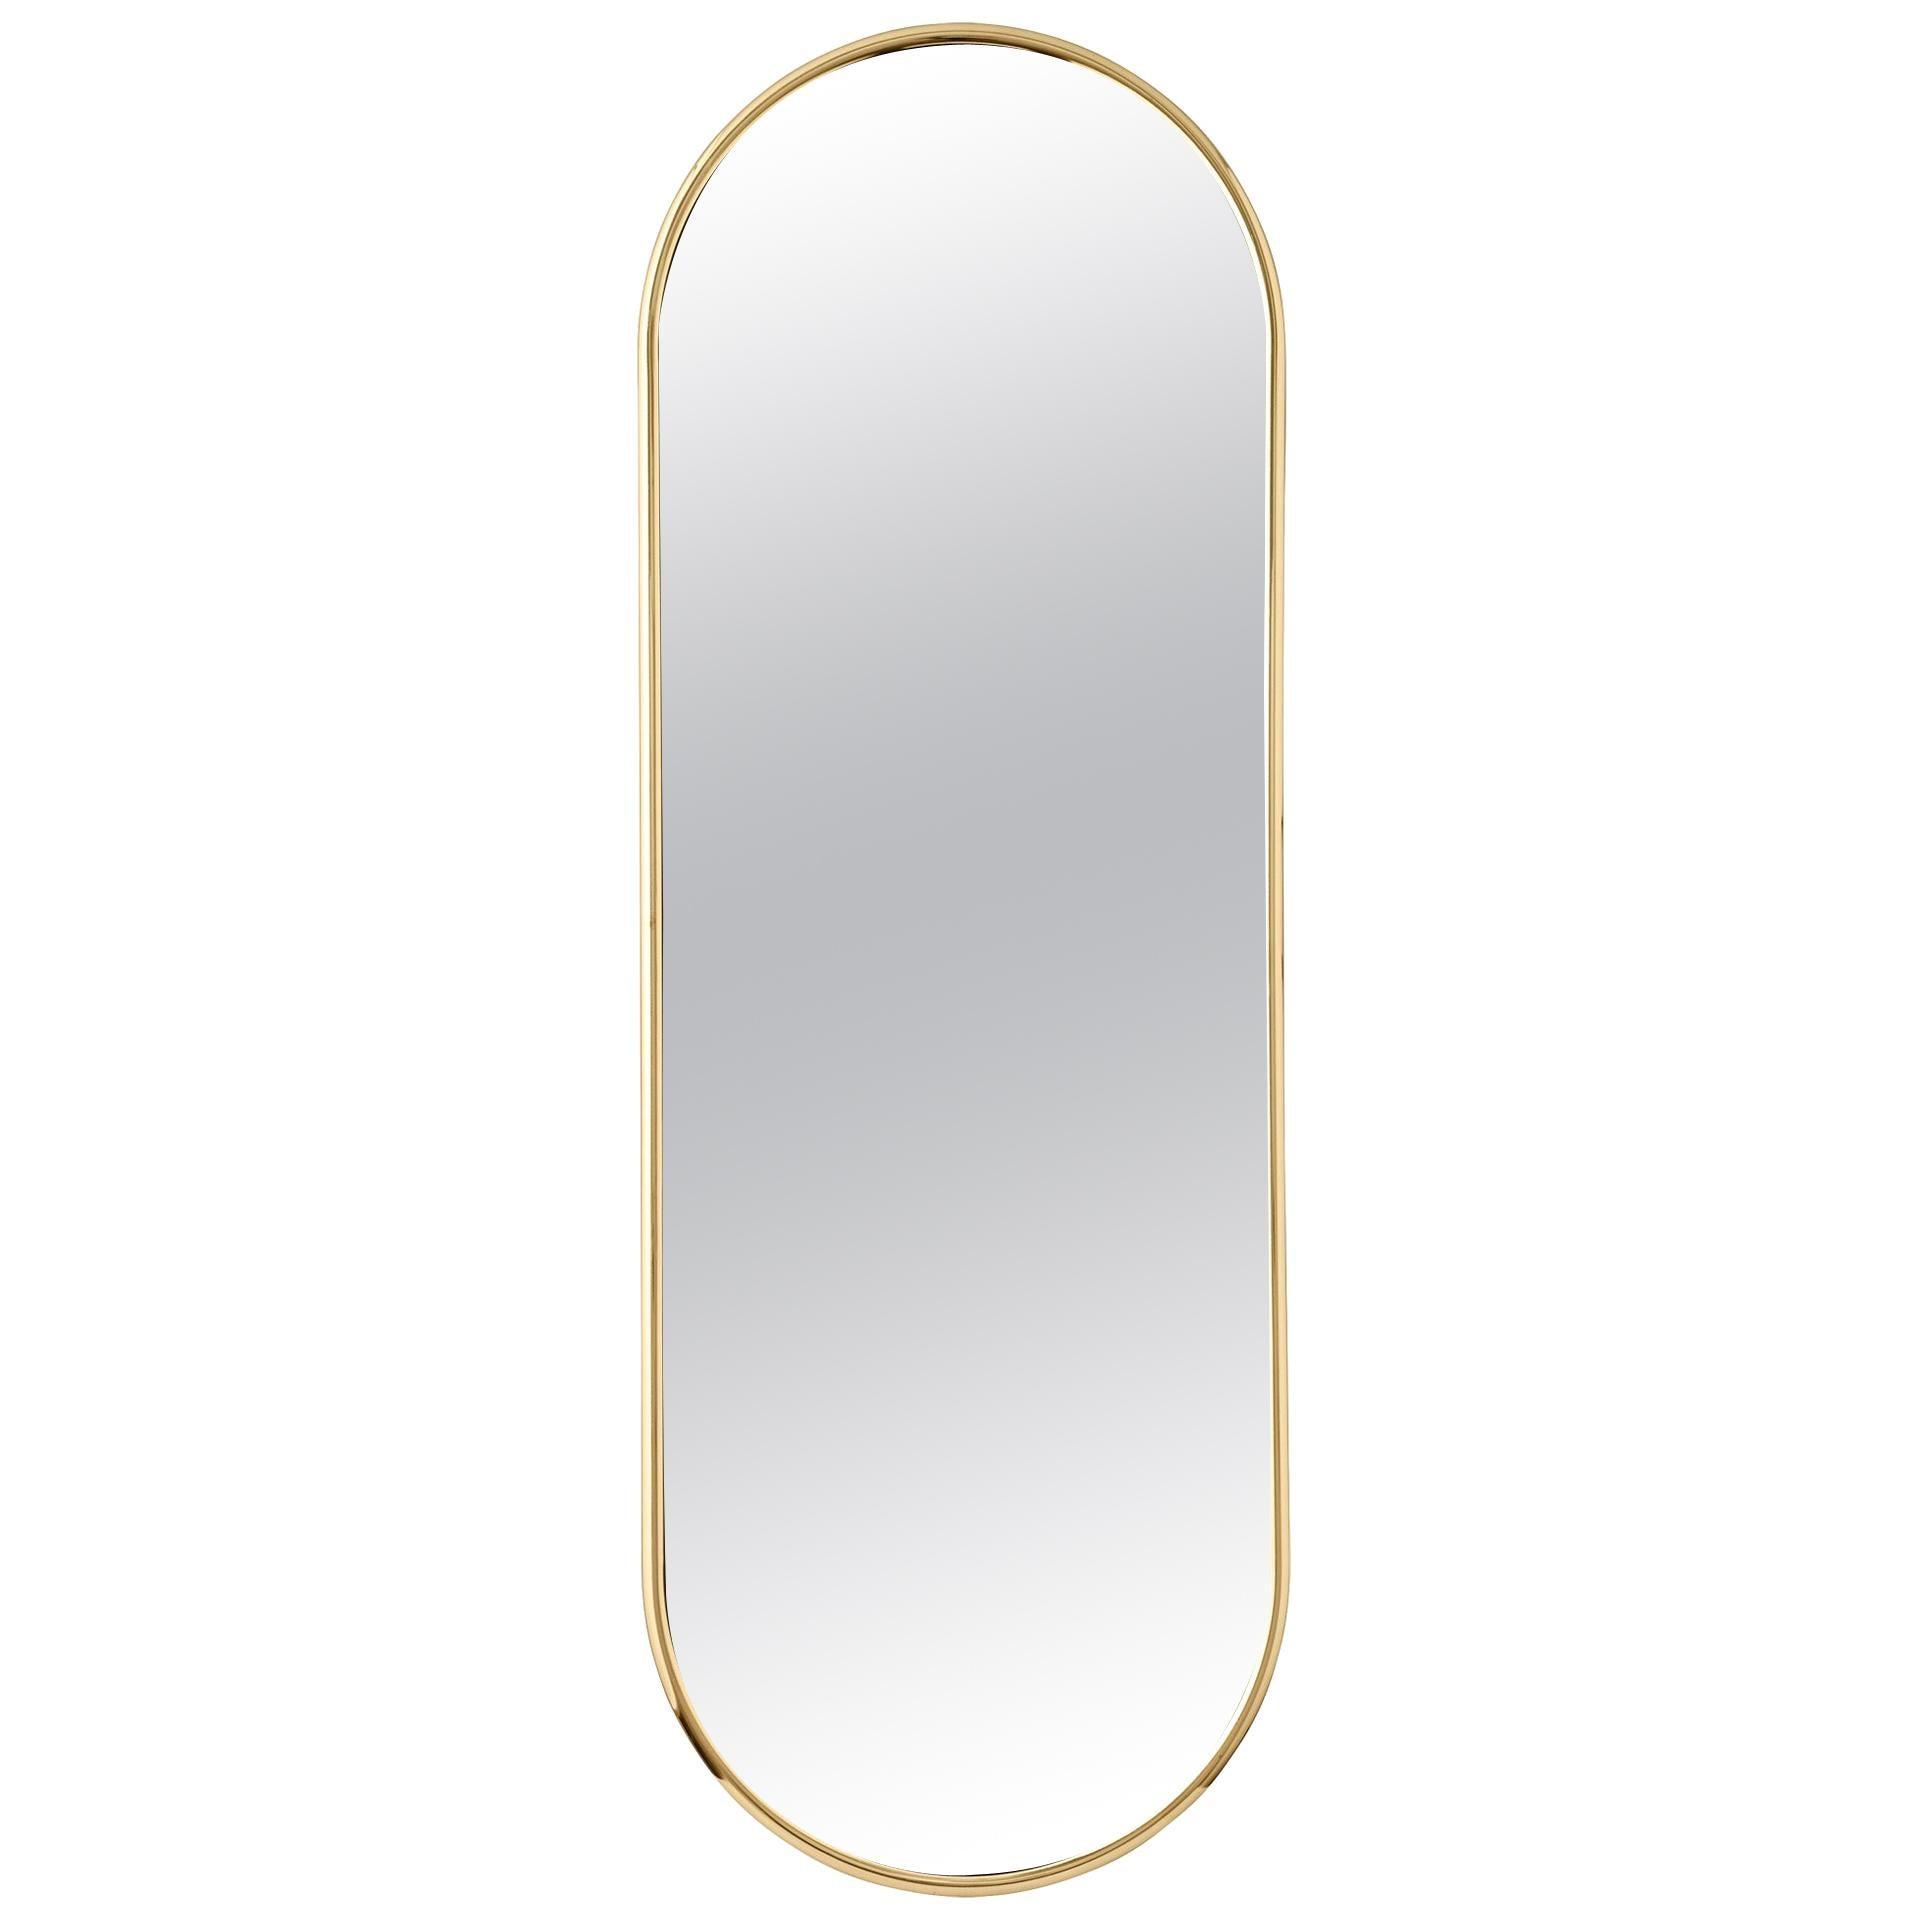 Angui Golden Wardrobe Mirror